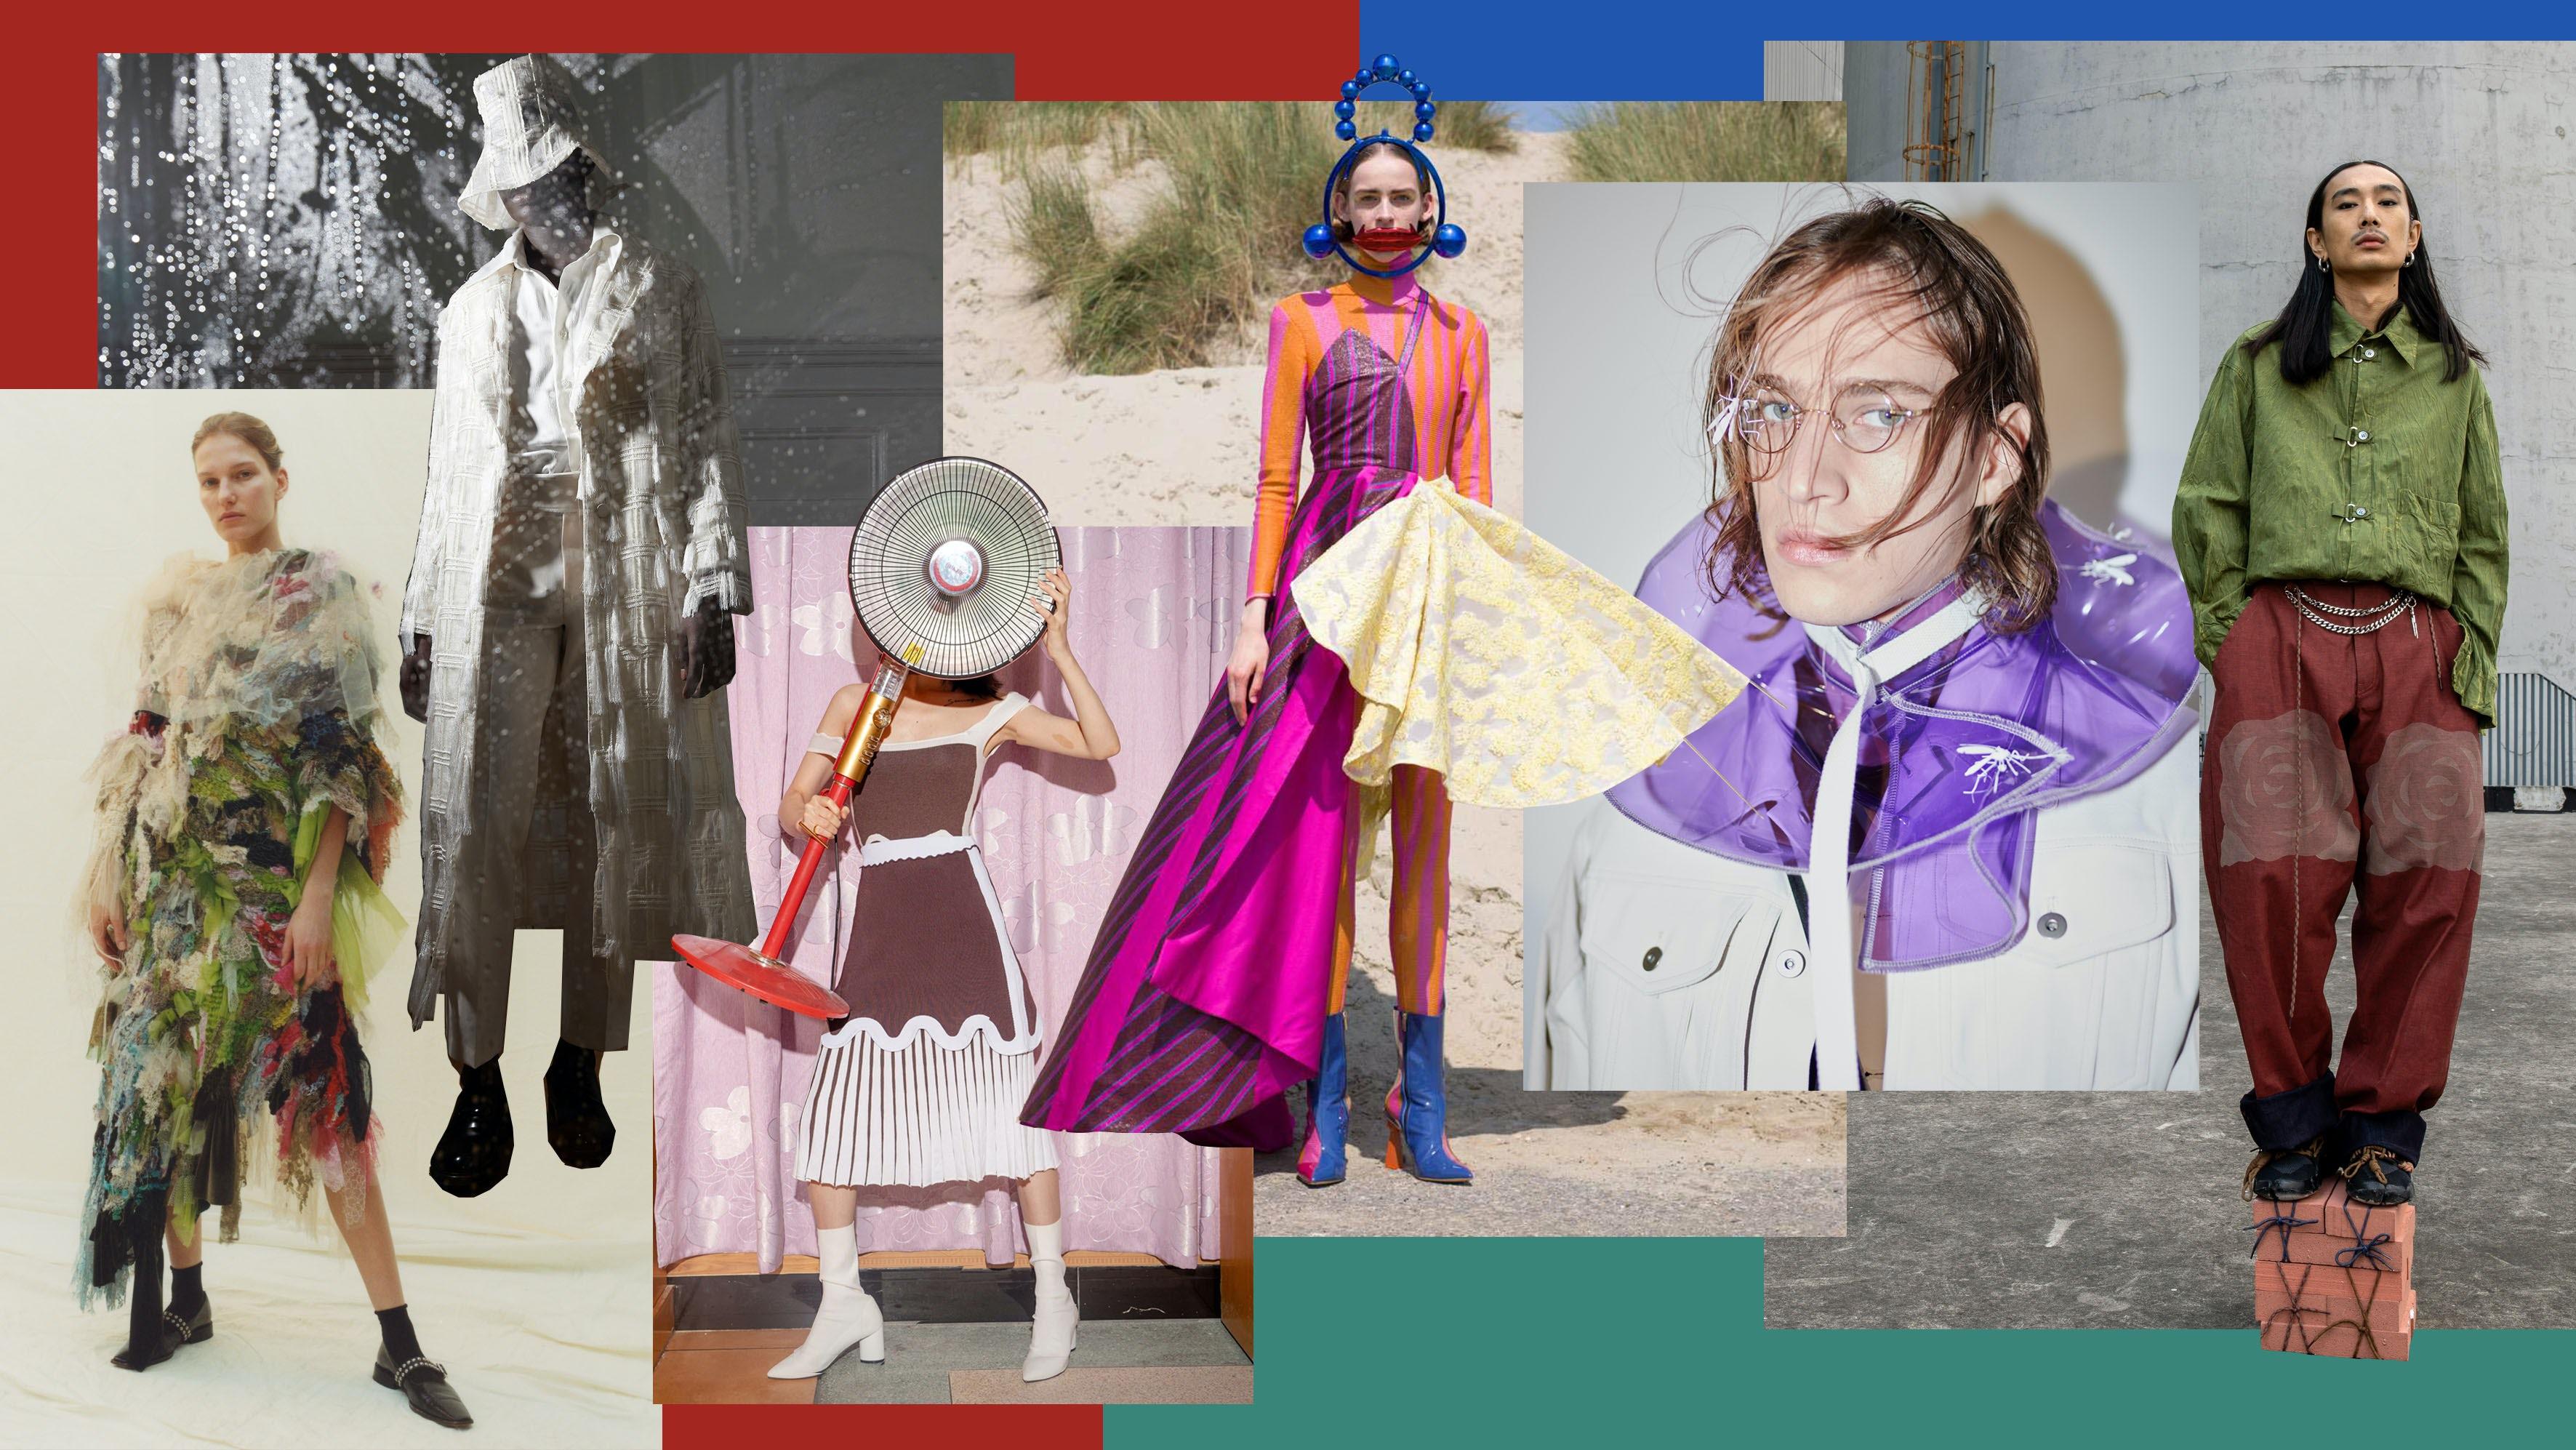 Images from BoF China Priza Finalists Caroline Hu, Xu Zhi, PH5, Shuting Qiu, Staffonly, Pronounce | Collage by BoF